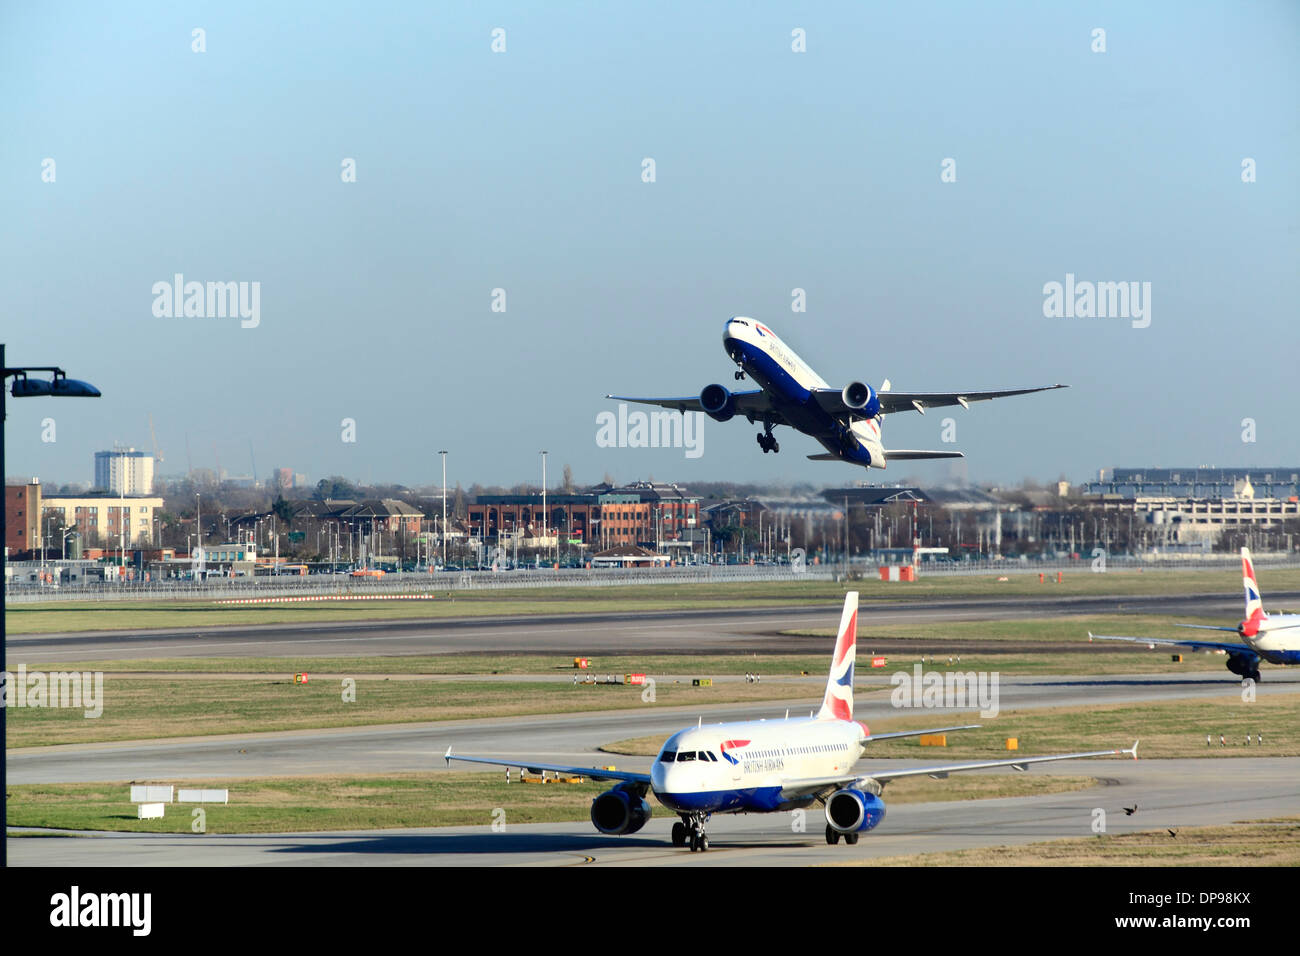 British Airways Boeing 767 takes off at Heathrow Airport runway 27R - Stock Image